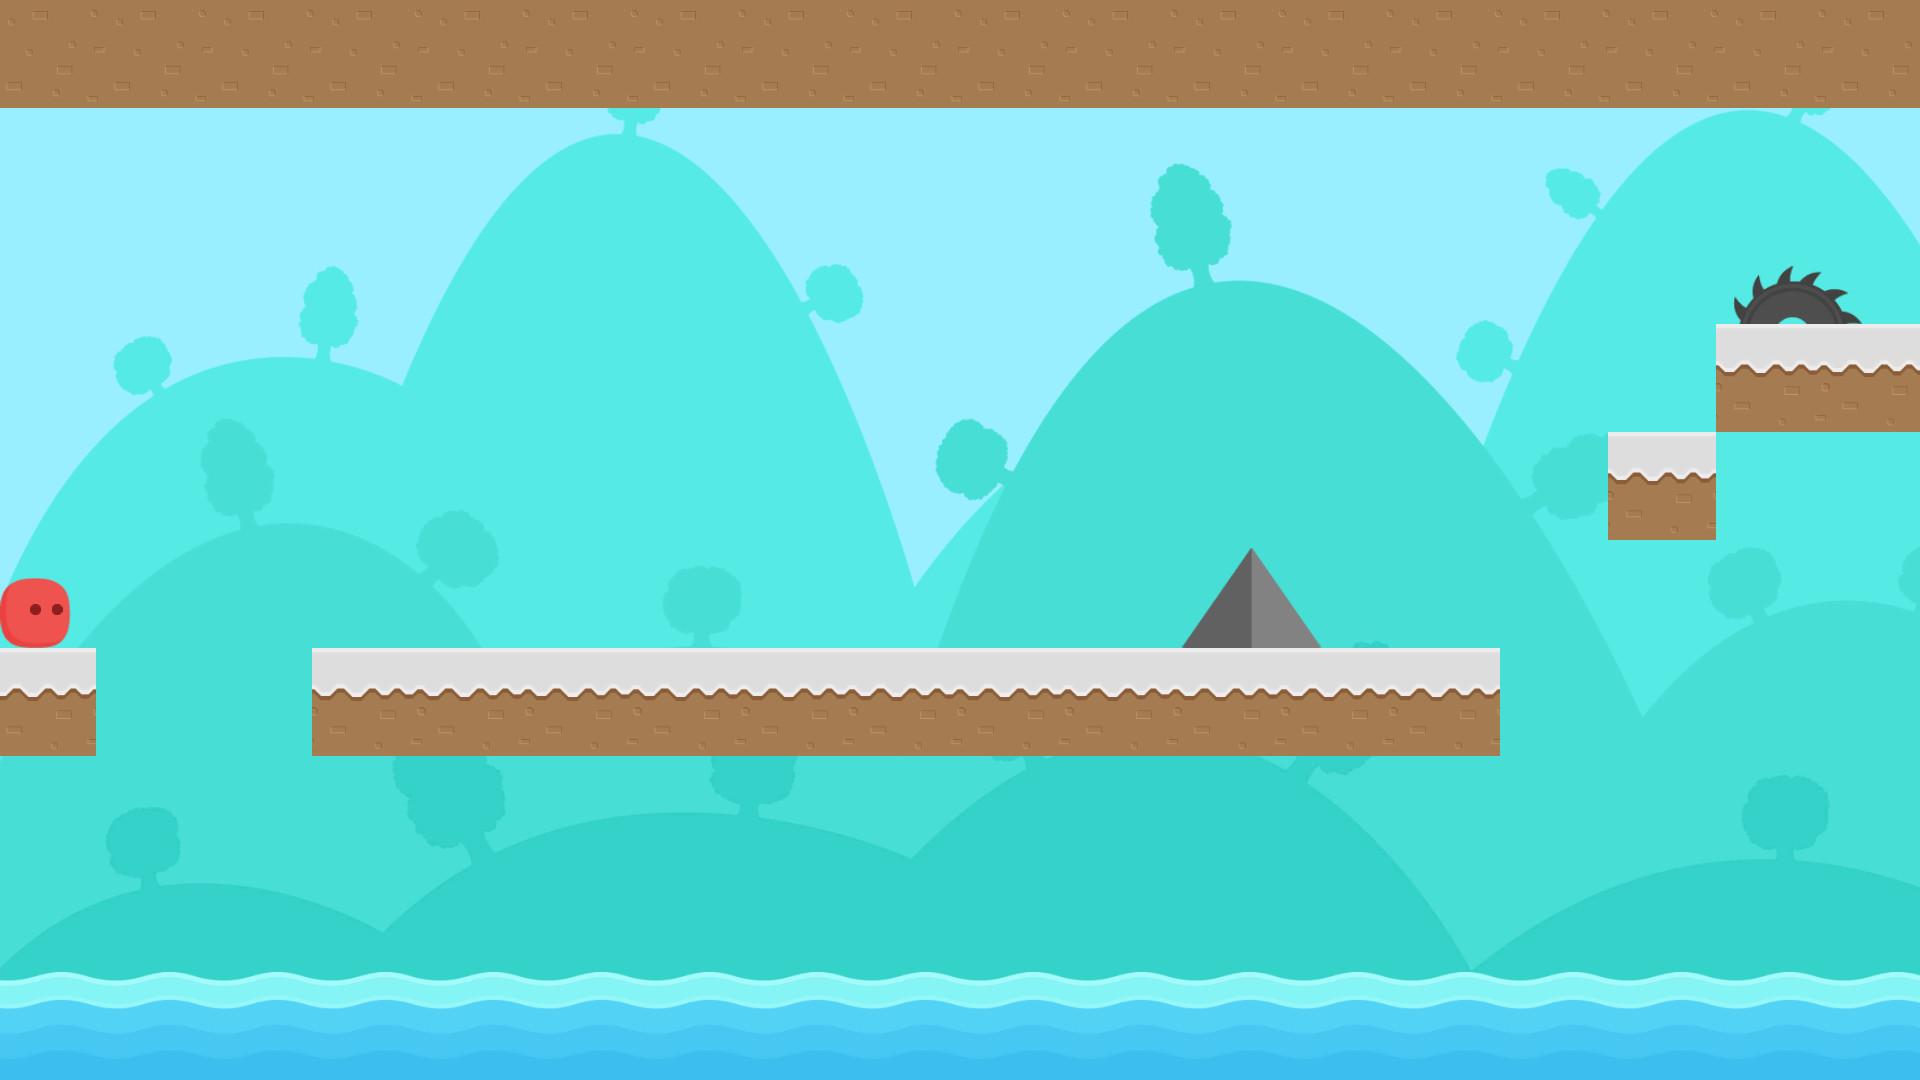 Traps Ahead! screenshot